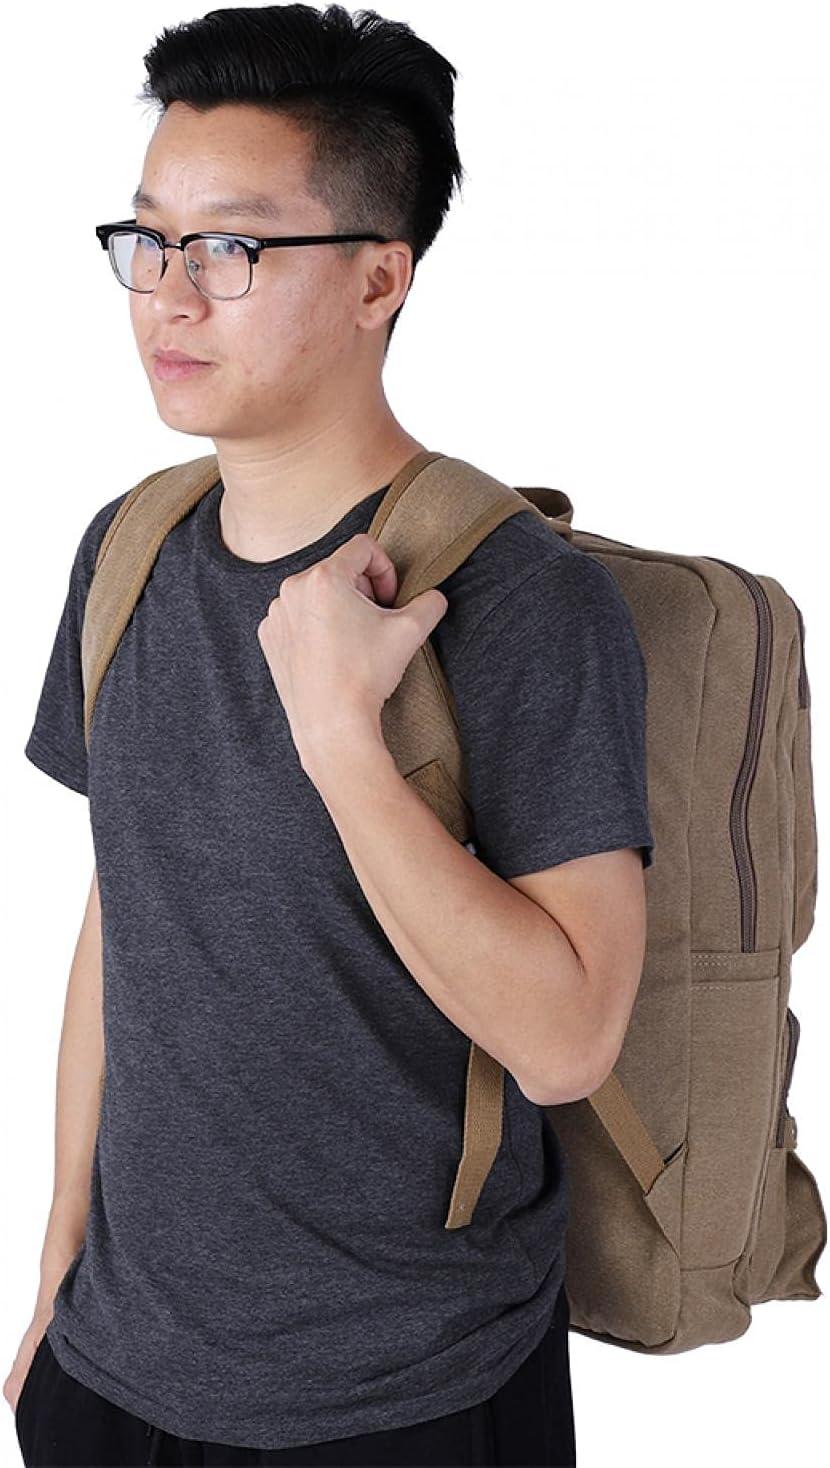 8K Carry Manufacturer Brand new direct delivery Drawing Shoulder Bag Sketch Artists Bags Field Dr